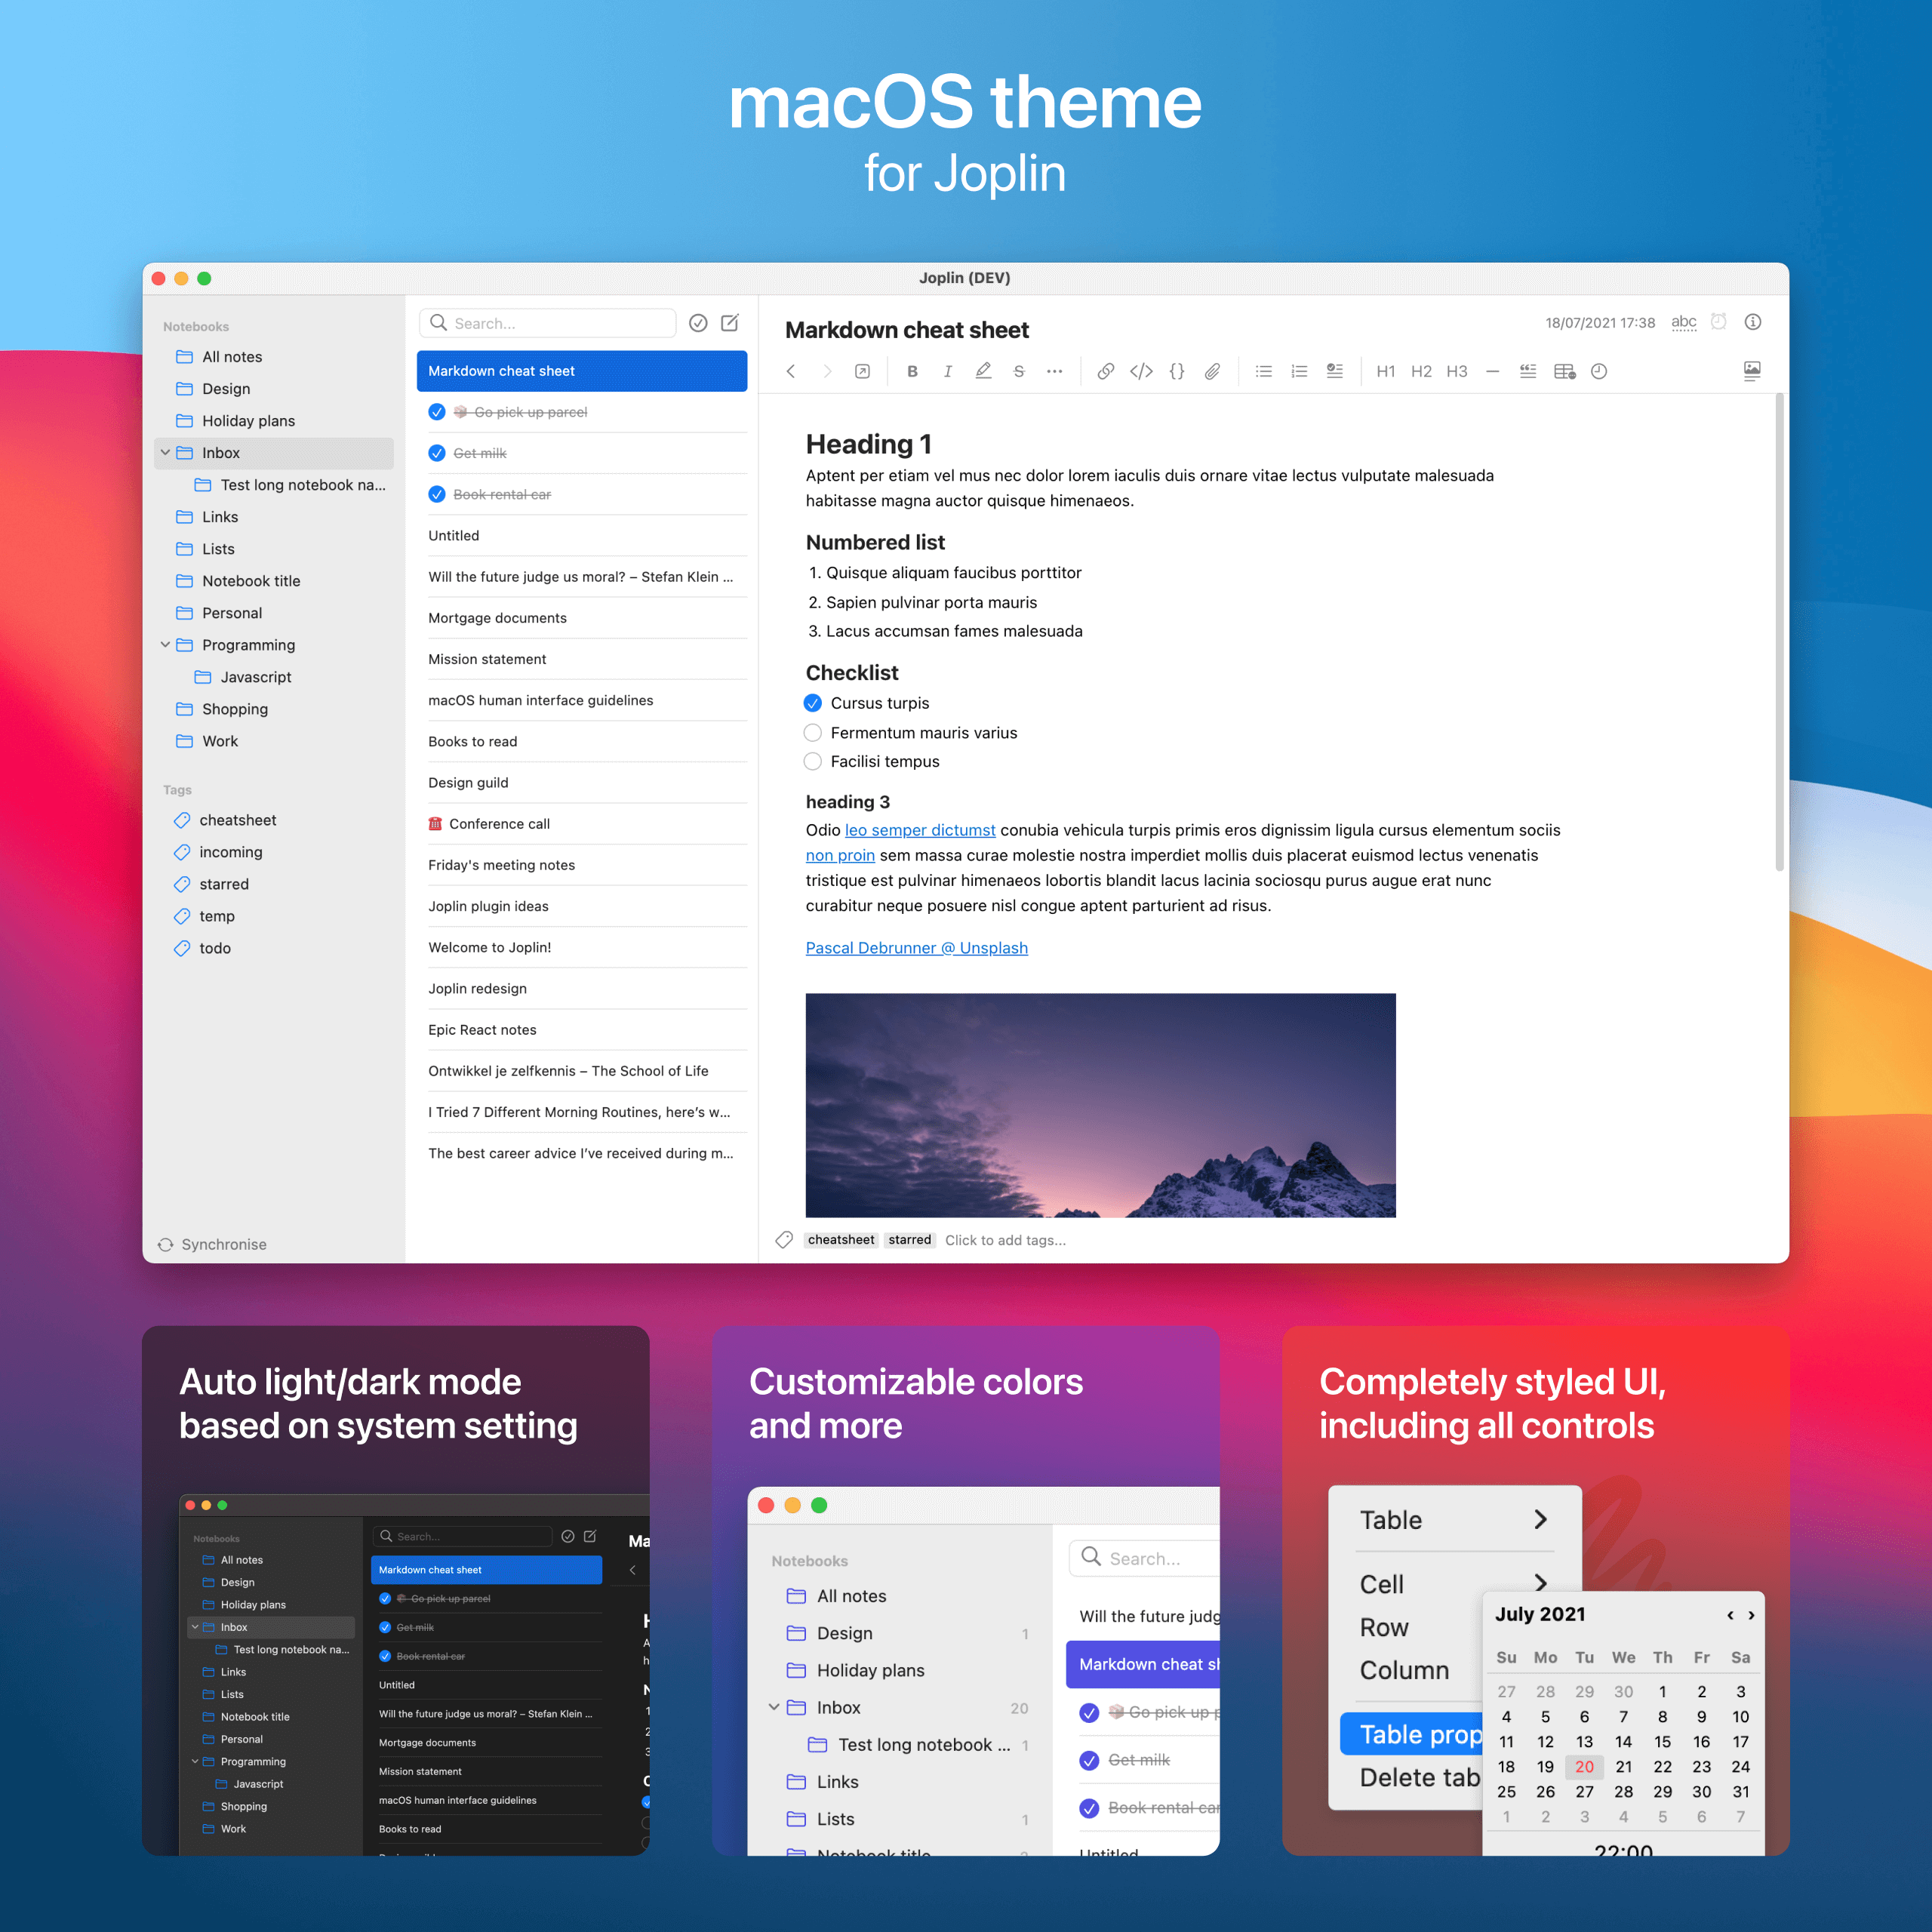 macOS theme for Joplin